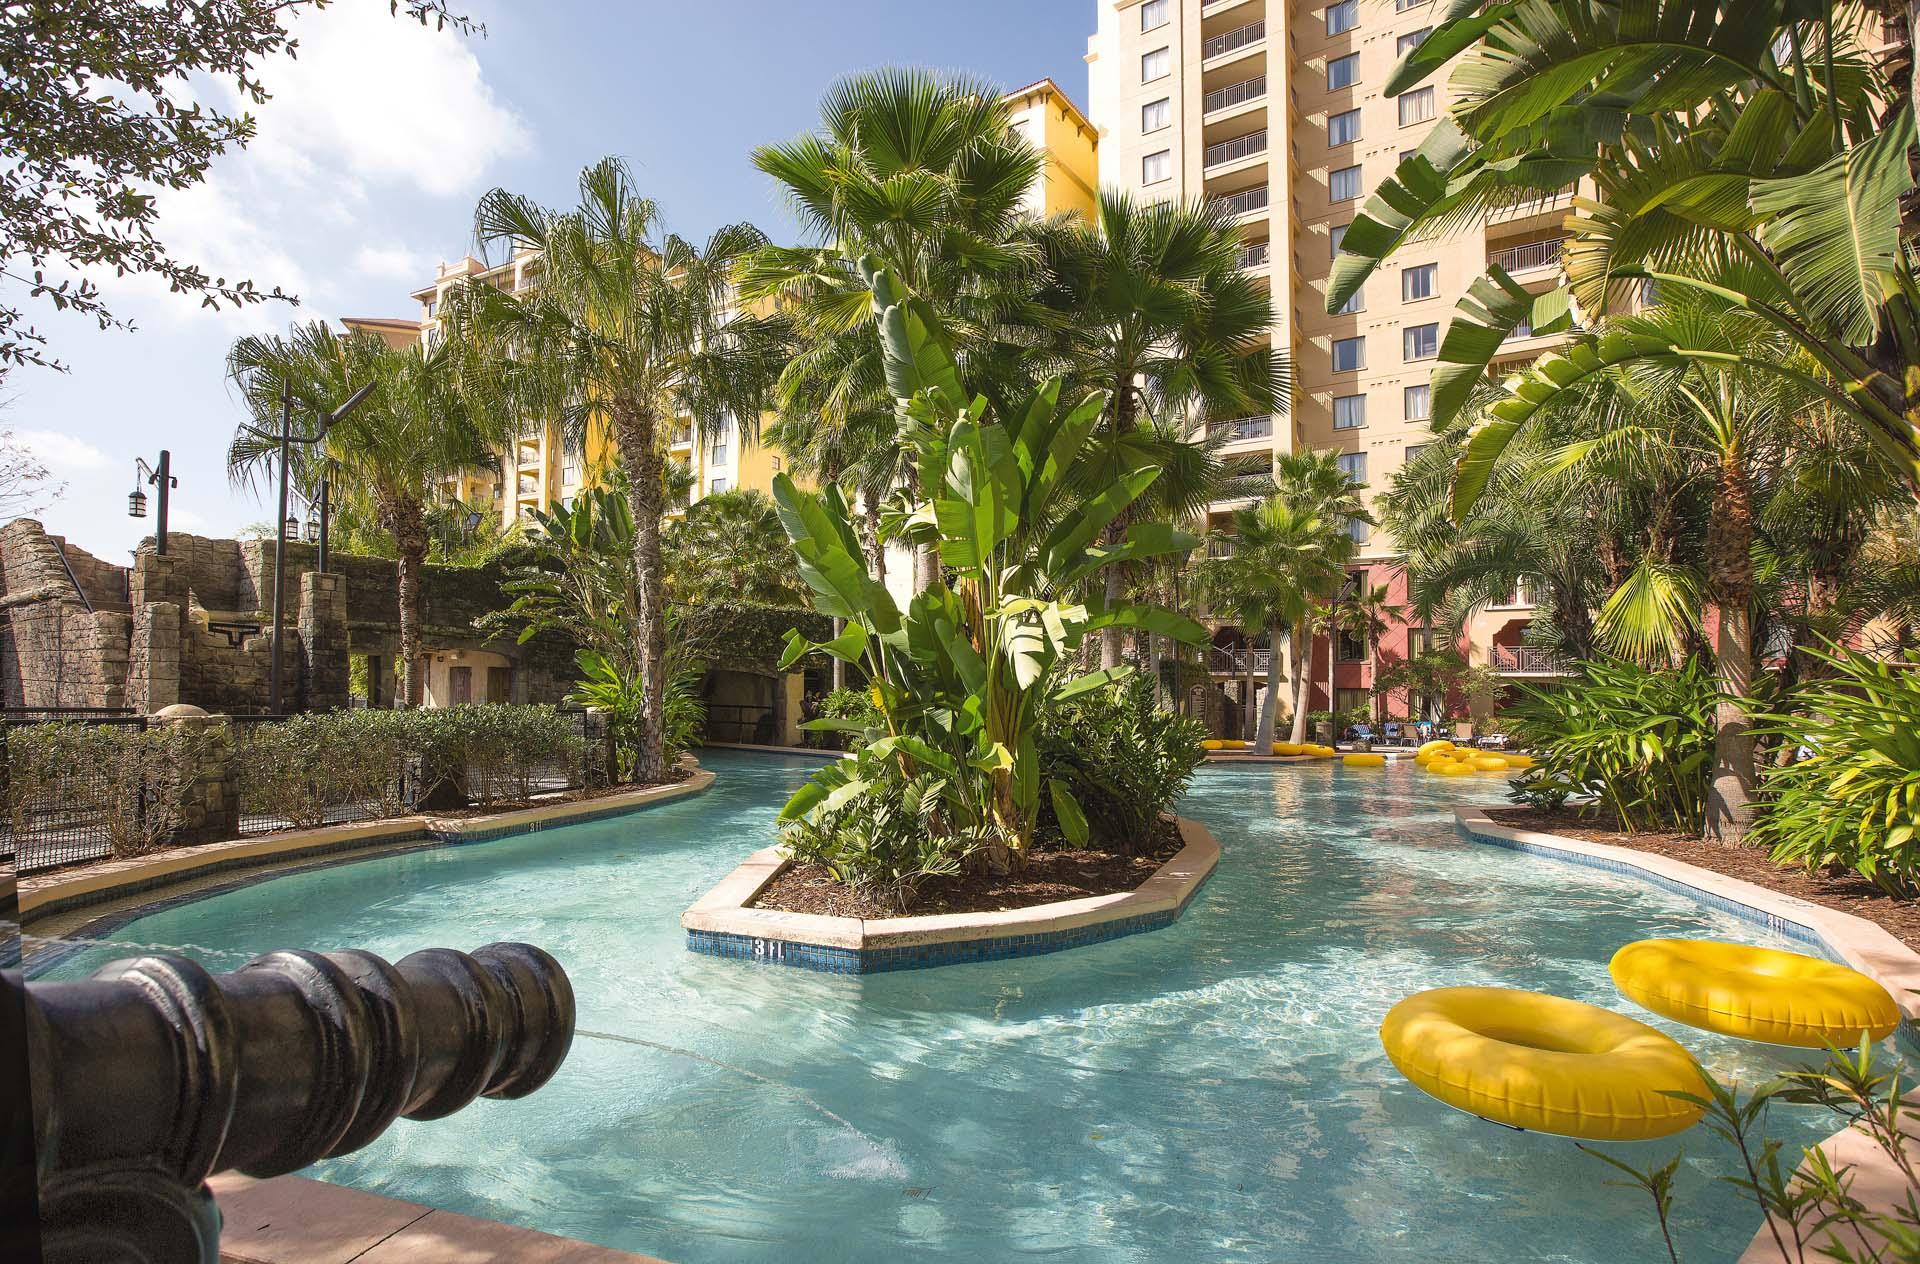 Apartment Bonnet Creek Orlando 3 Bedroom 2 Bath photo 16718510